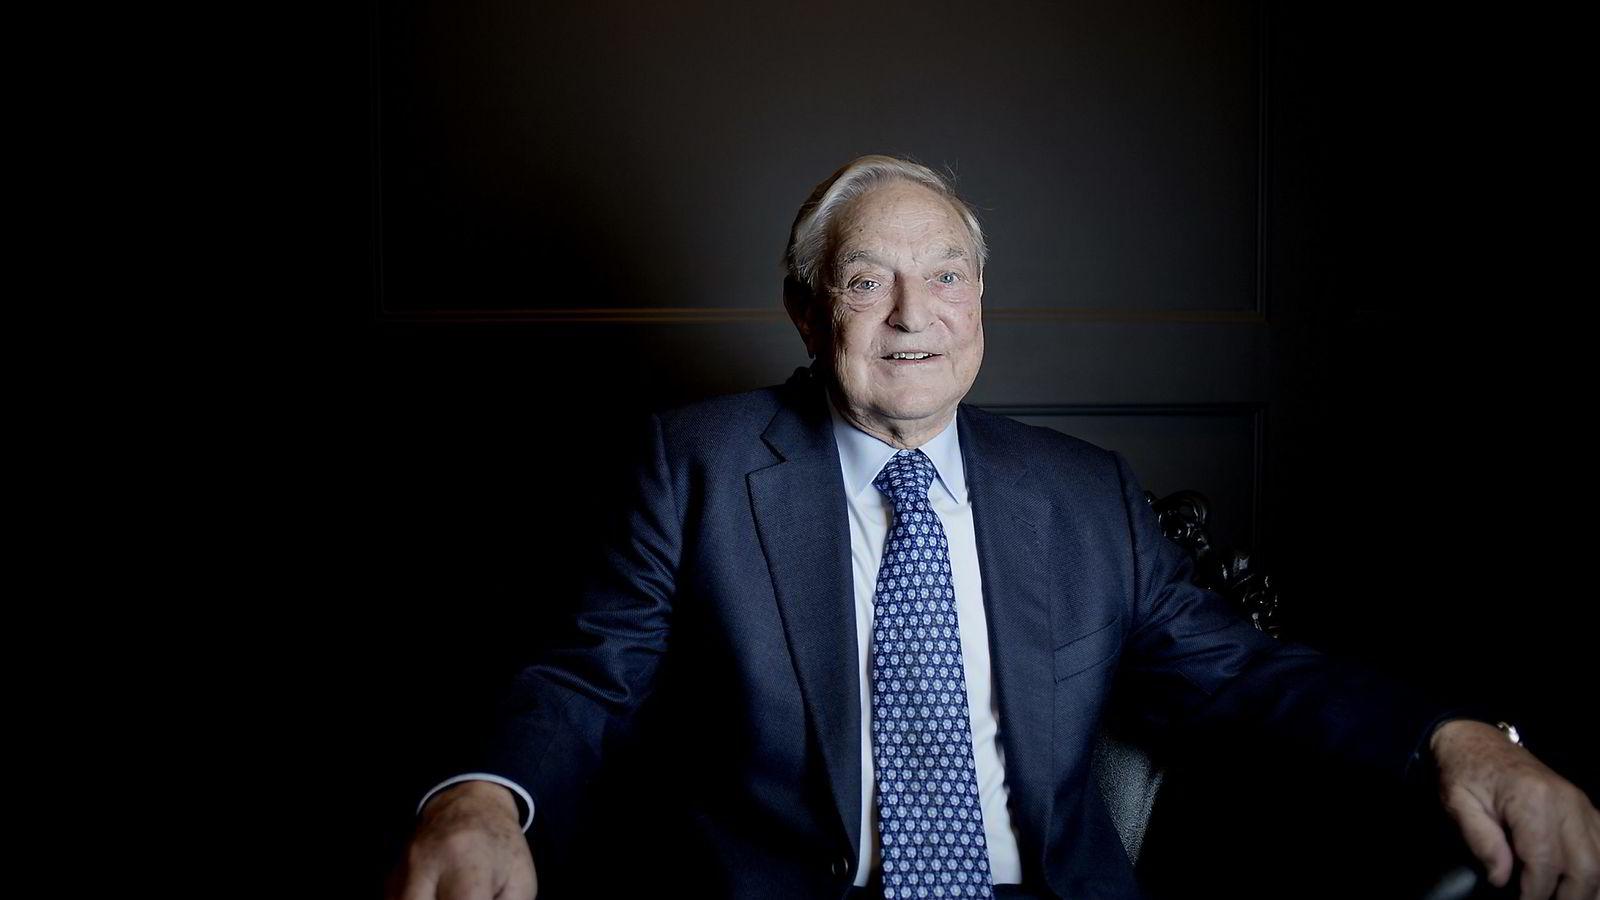 Hedgefondmilliardæren George Soros under sitt Norgesbesøk i 2012. FOTO: Luca Kleve-Ruud